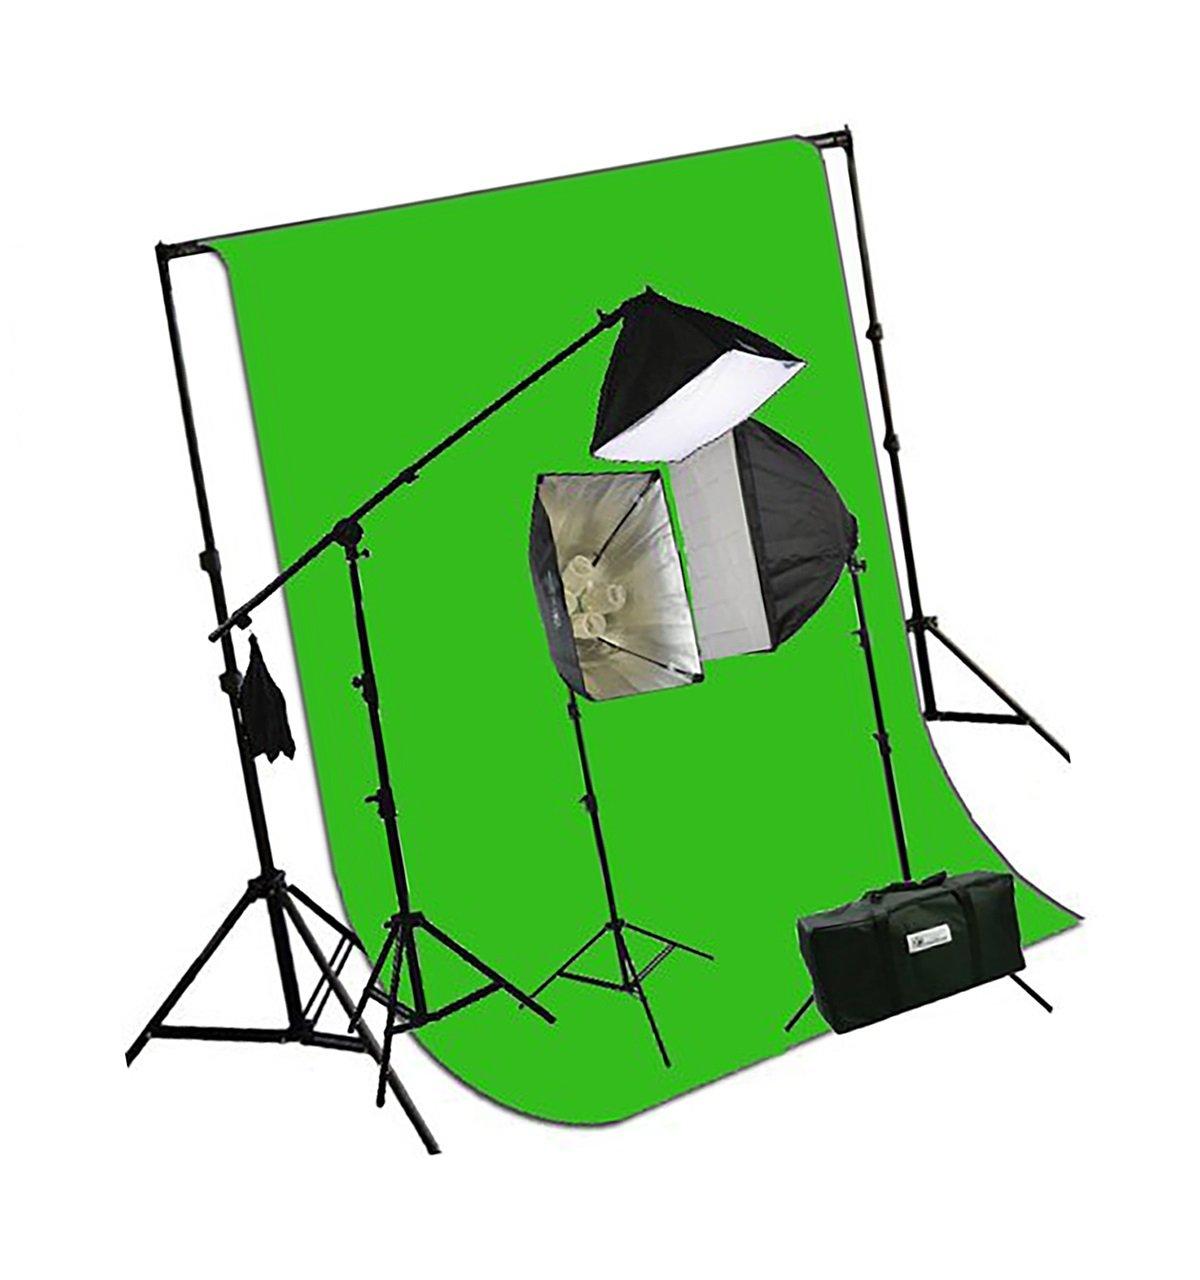 ePhotoInc 3200 K暖かい照明10 x 20 Muslin Chromakeyグリーン画面背景サポートスタンドキット2700ワットヘアライトブームスタンド写真ビデオスタジオ照明キットh604sb-1020g 3200 K   B00CRQPR26